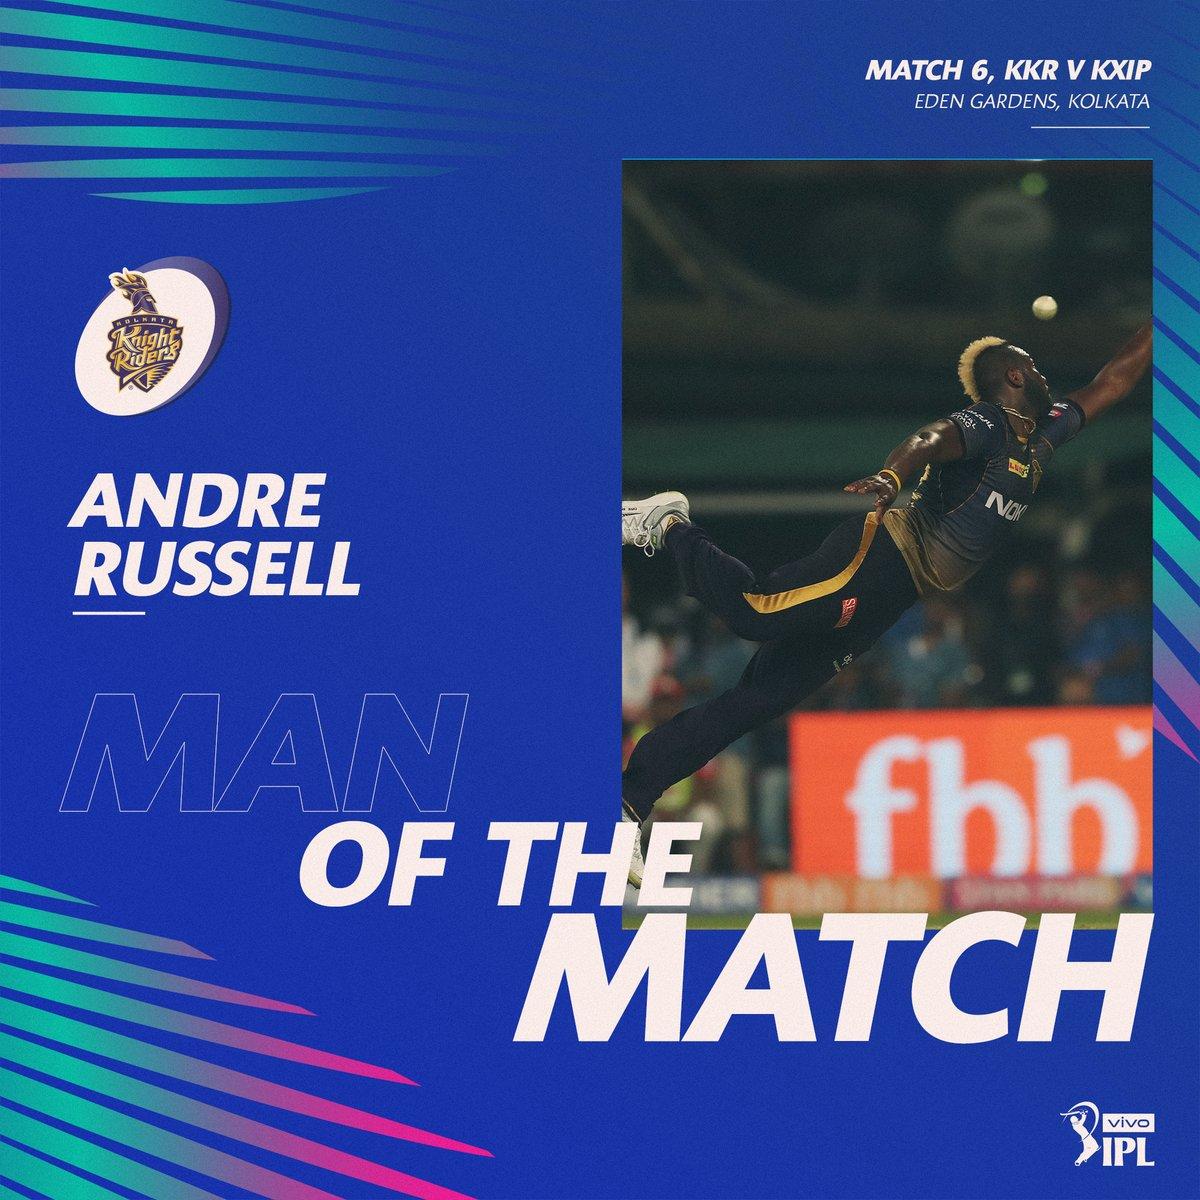 KKR vs KXIP: KKR won by 28 runs, Andre Russell's performance